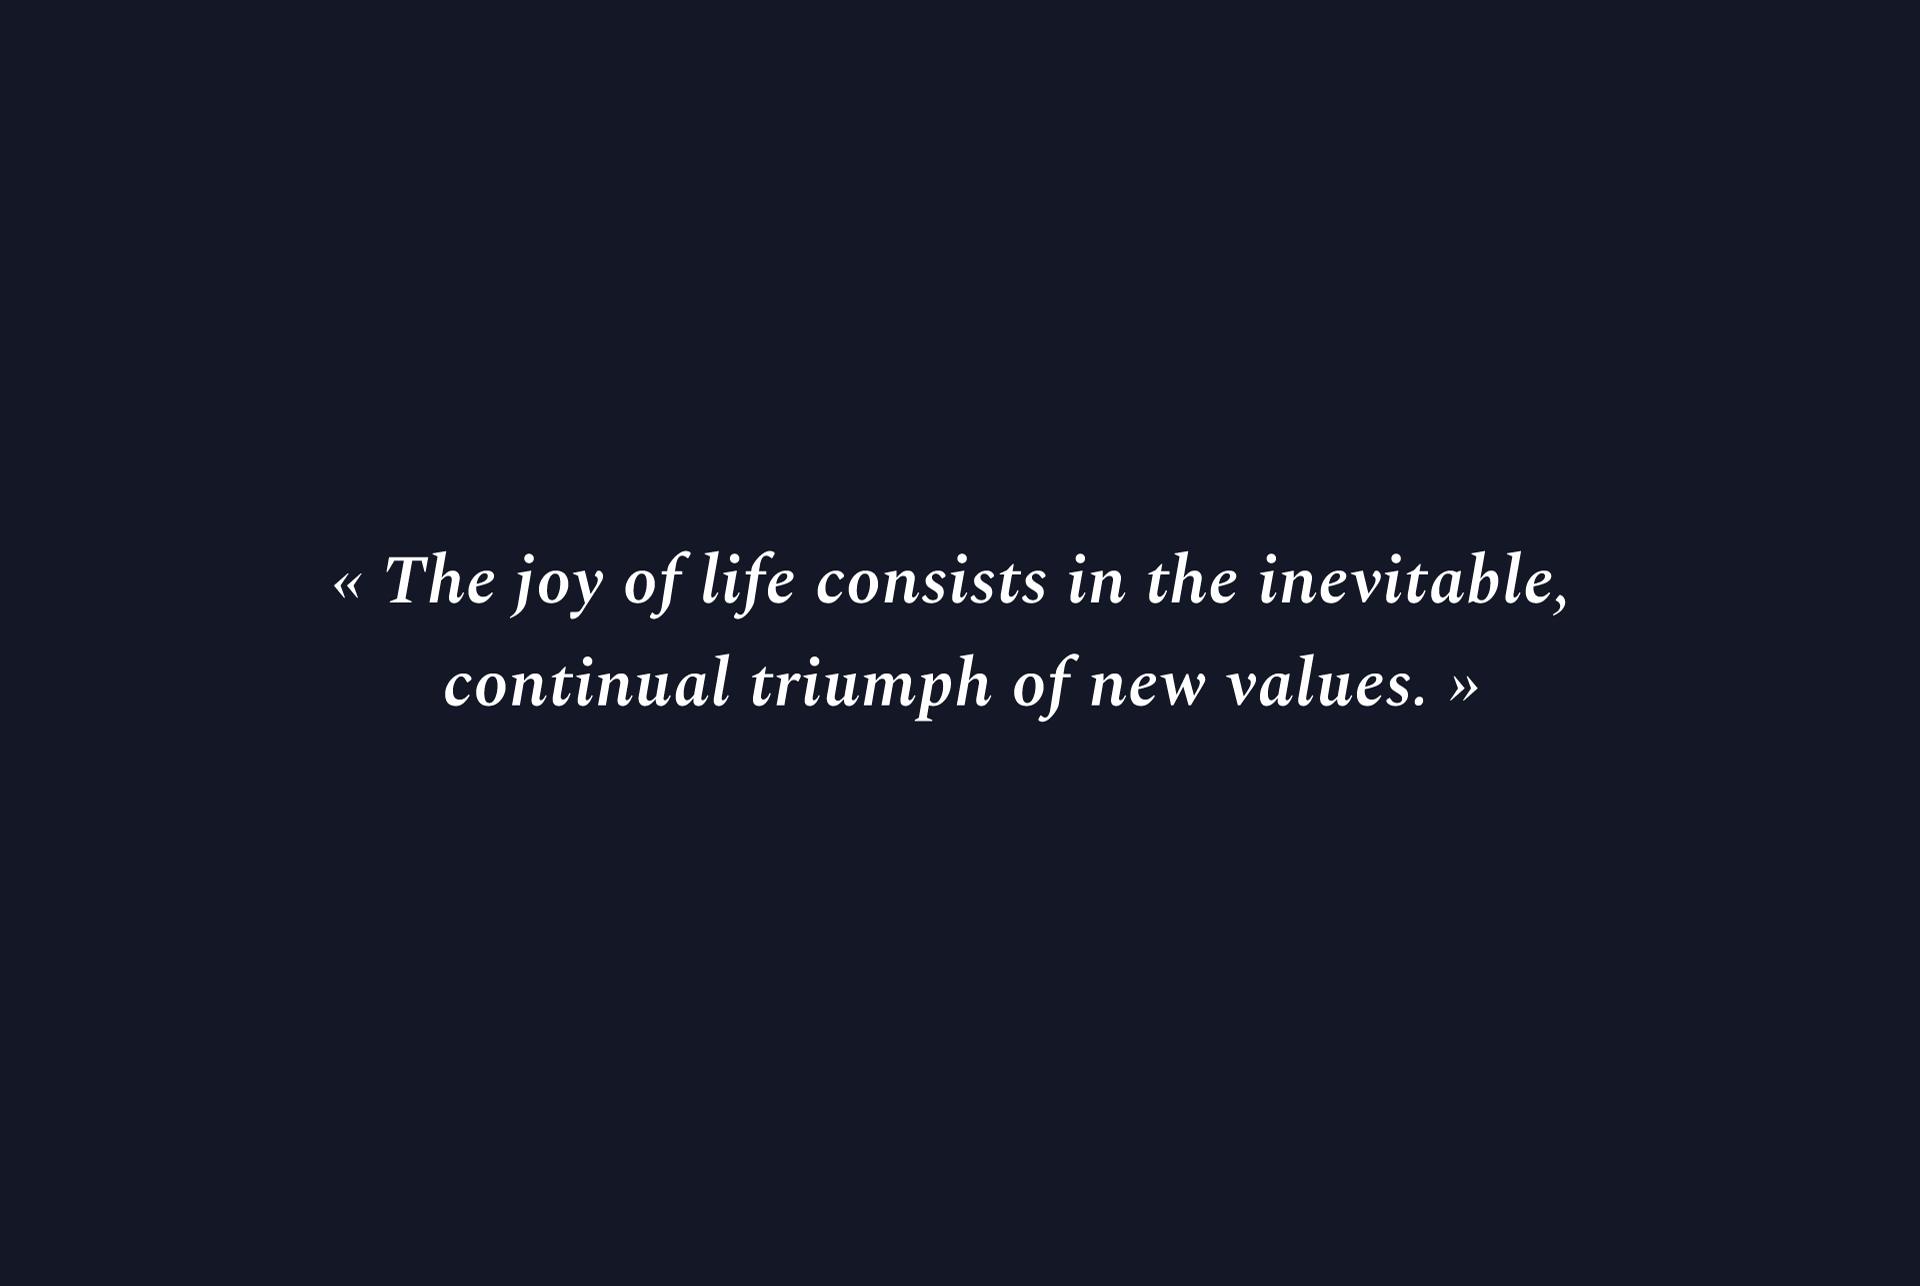 pablo-the-joy-of-life